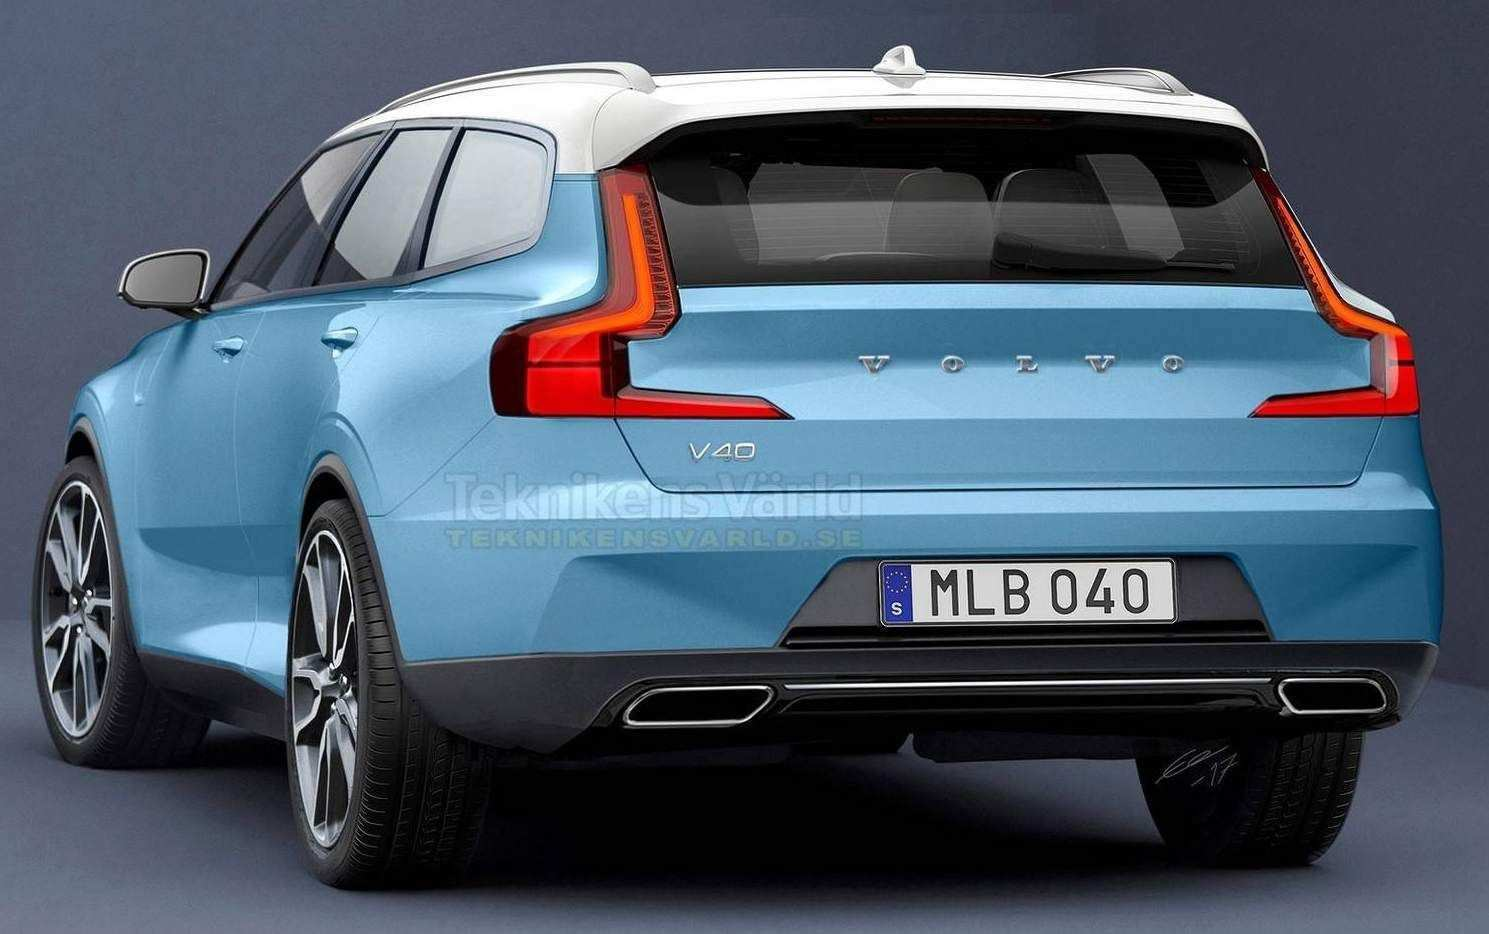 16 Concept of Volvo V40 2020 Interior Interior with Volvo V40 2020 Interior